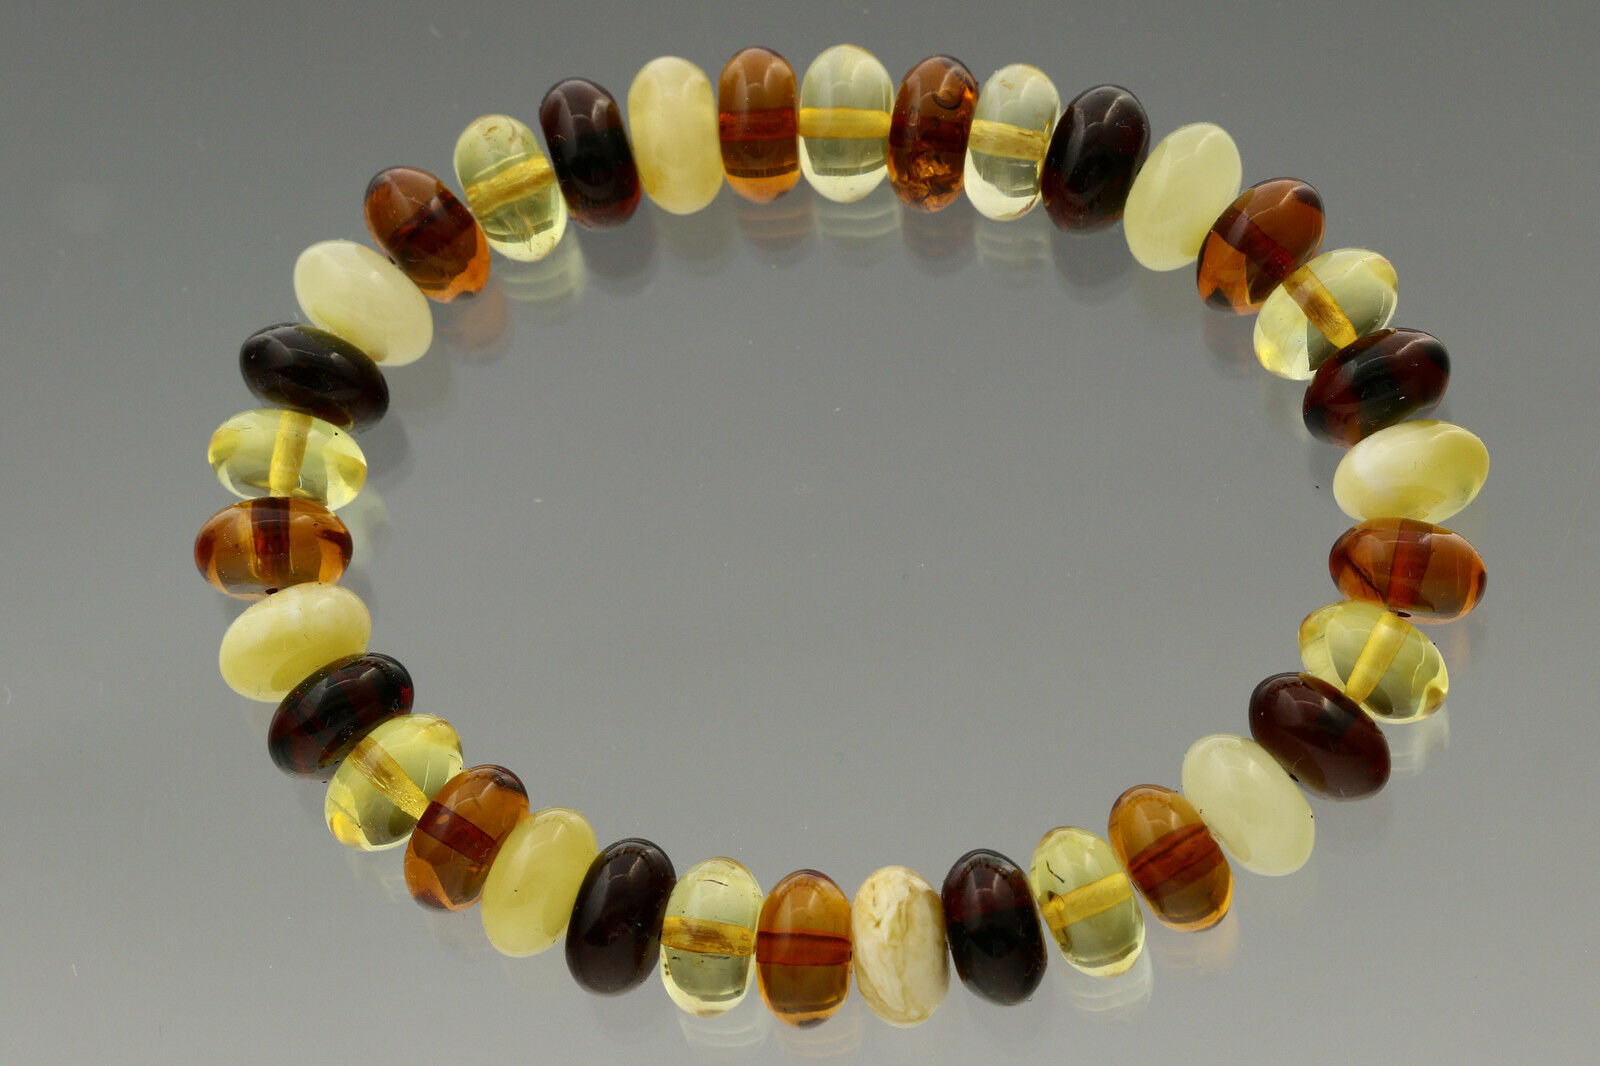 Button Shape Beads Genuine Baltic Amber Stretch Bracelet 10.6g b170607-10